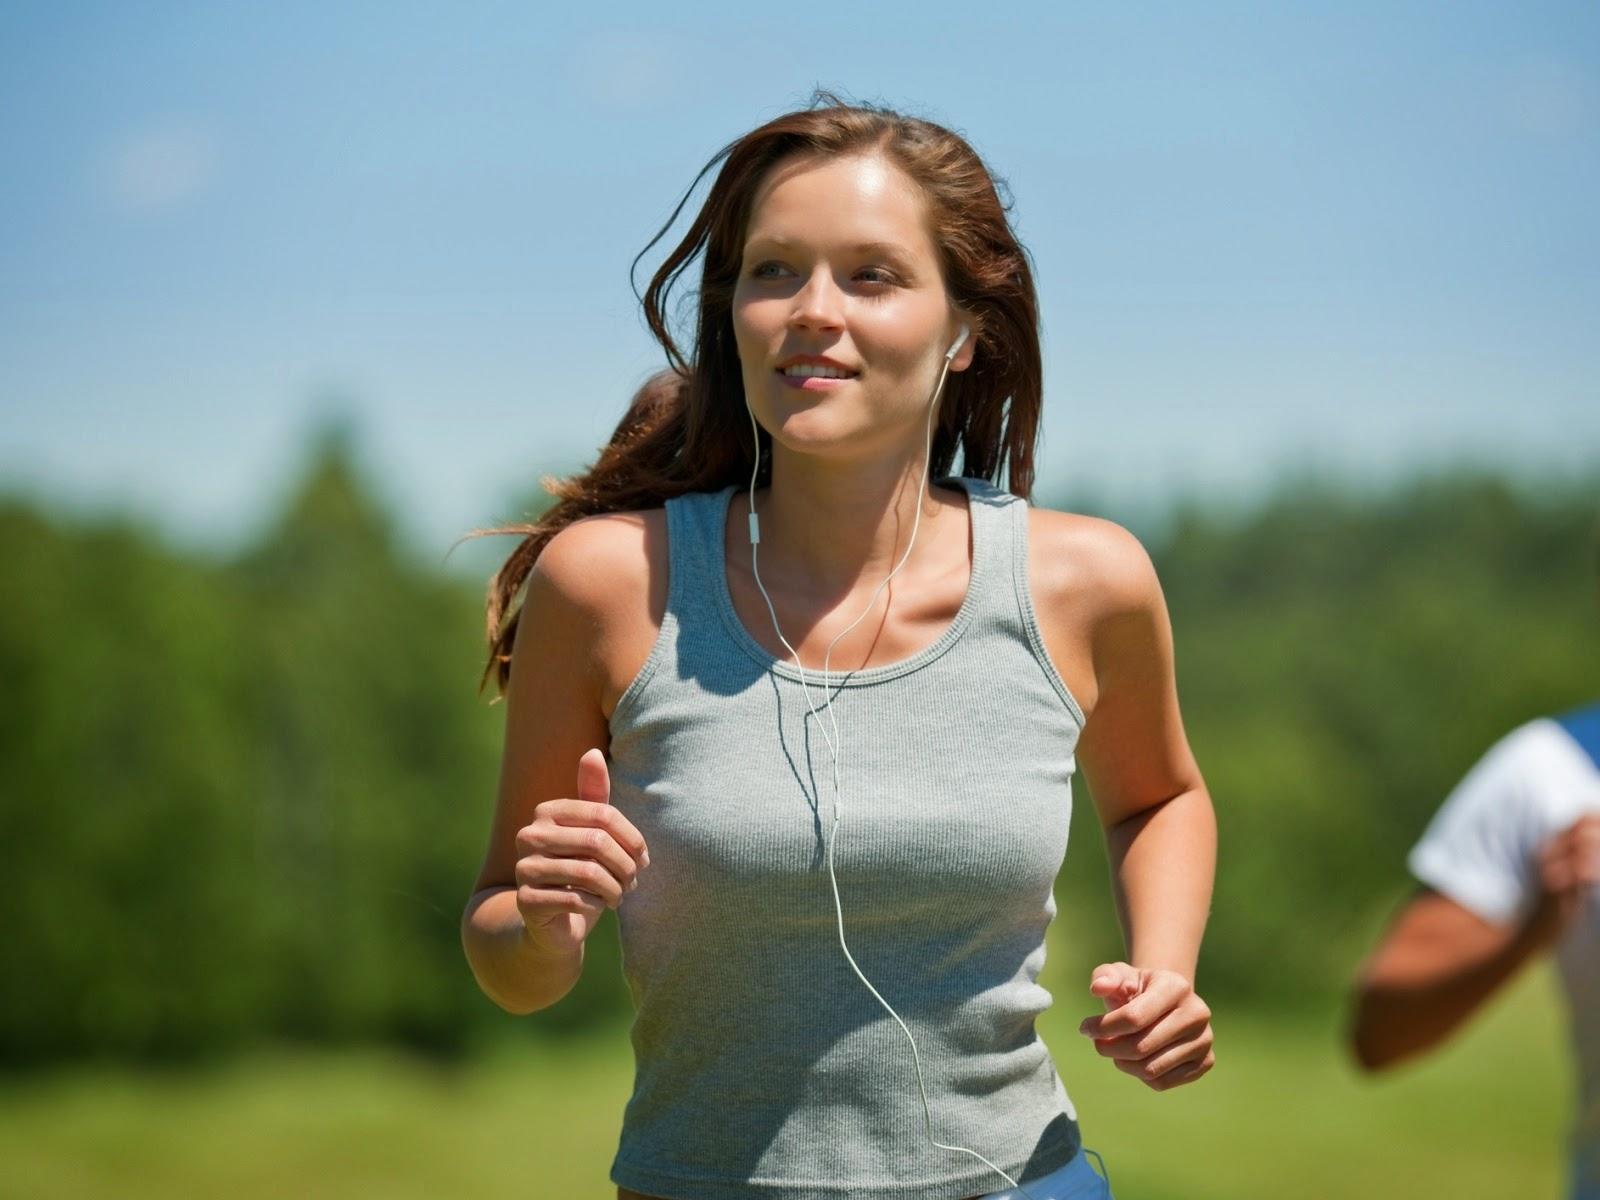 Cara Melangsingkan Tubuh, olah raga, tubuh langsing alami